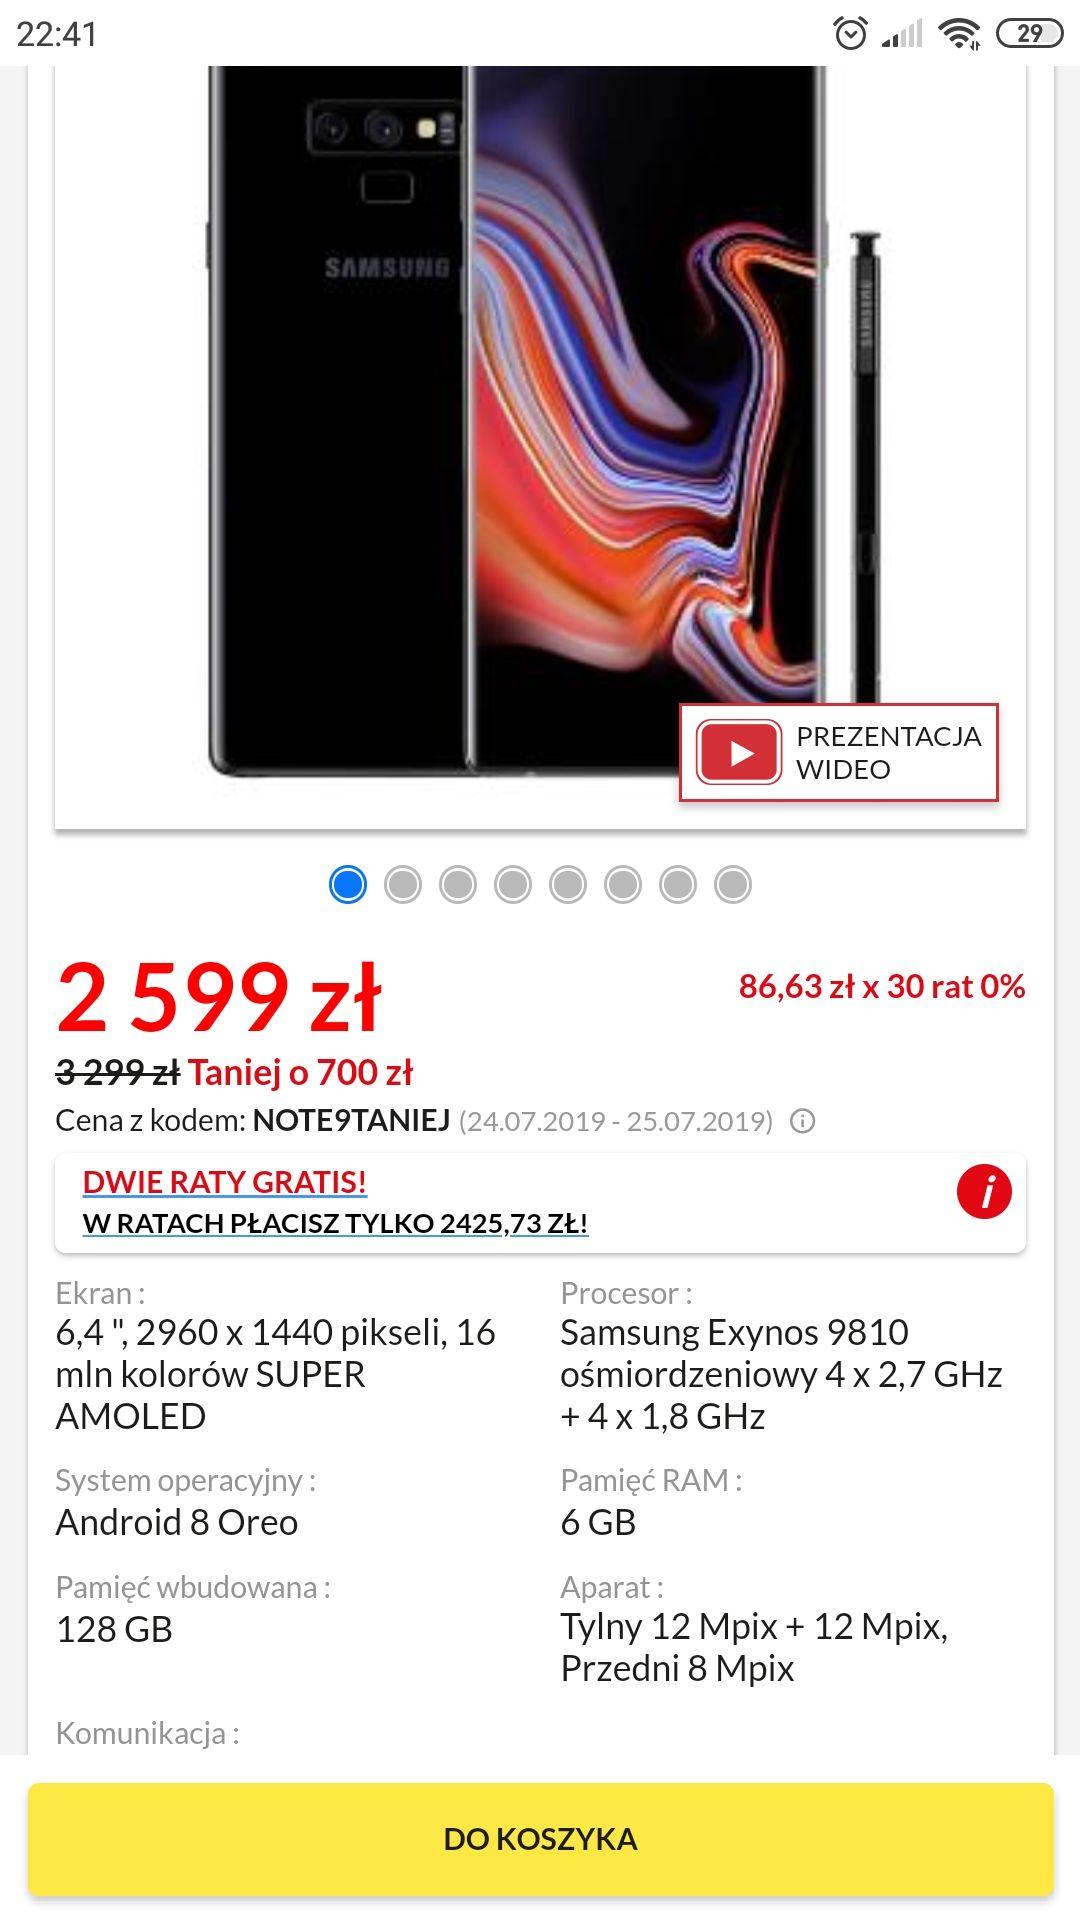 Samsung Galaxy Note 9 - RTV EURO AGD